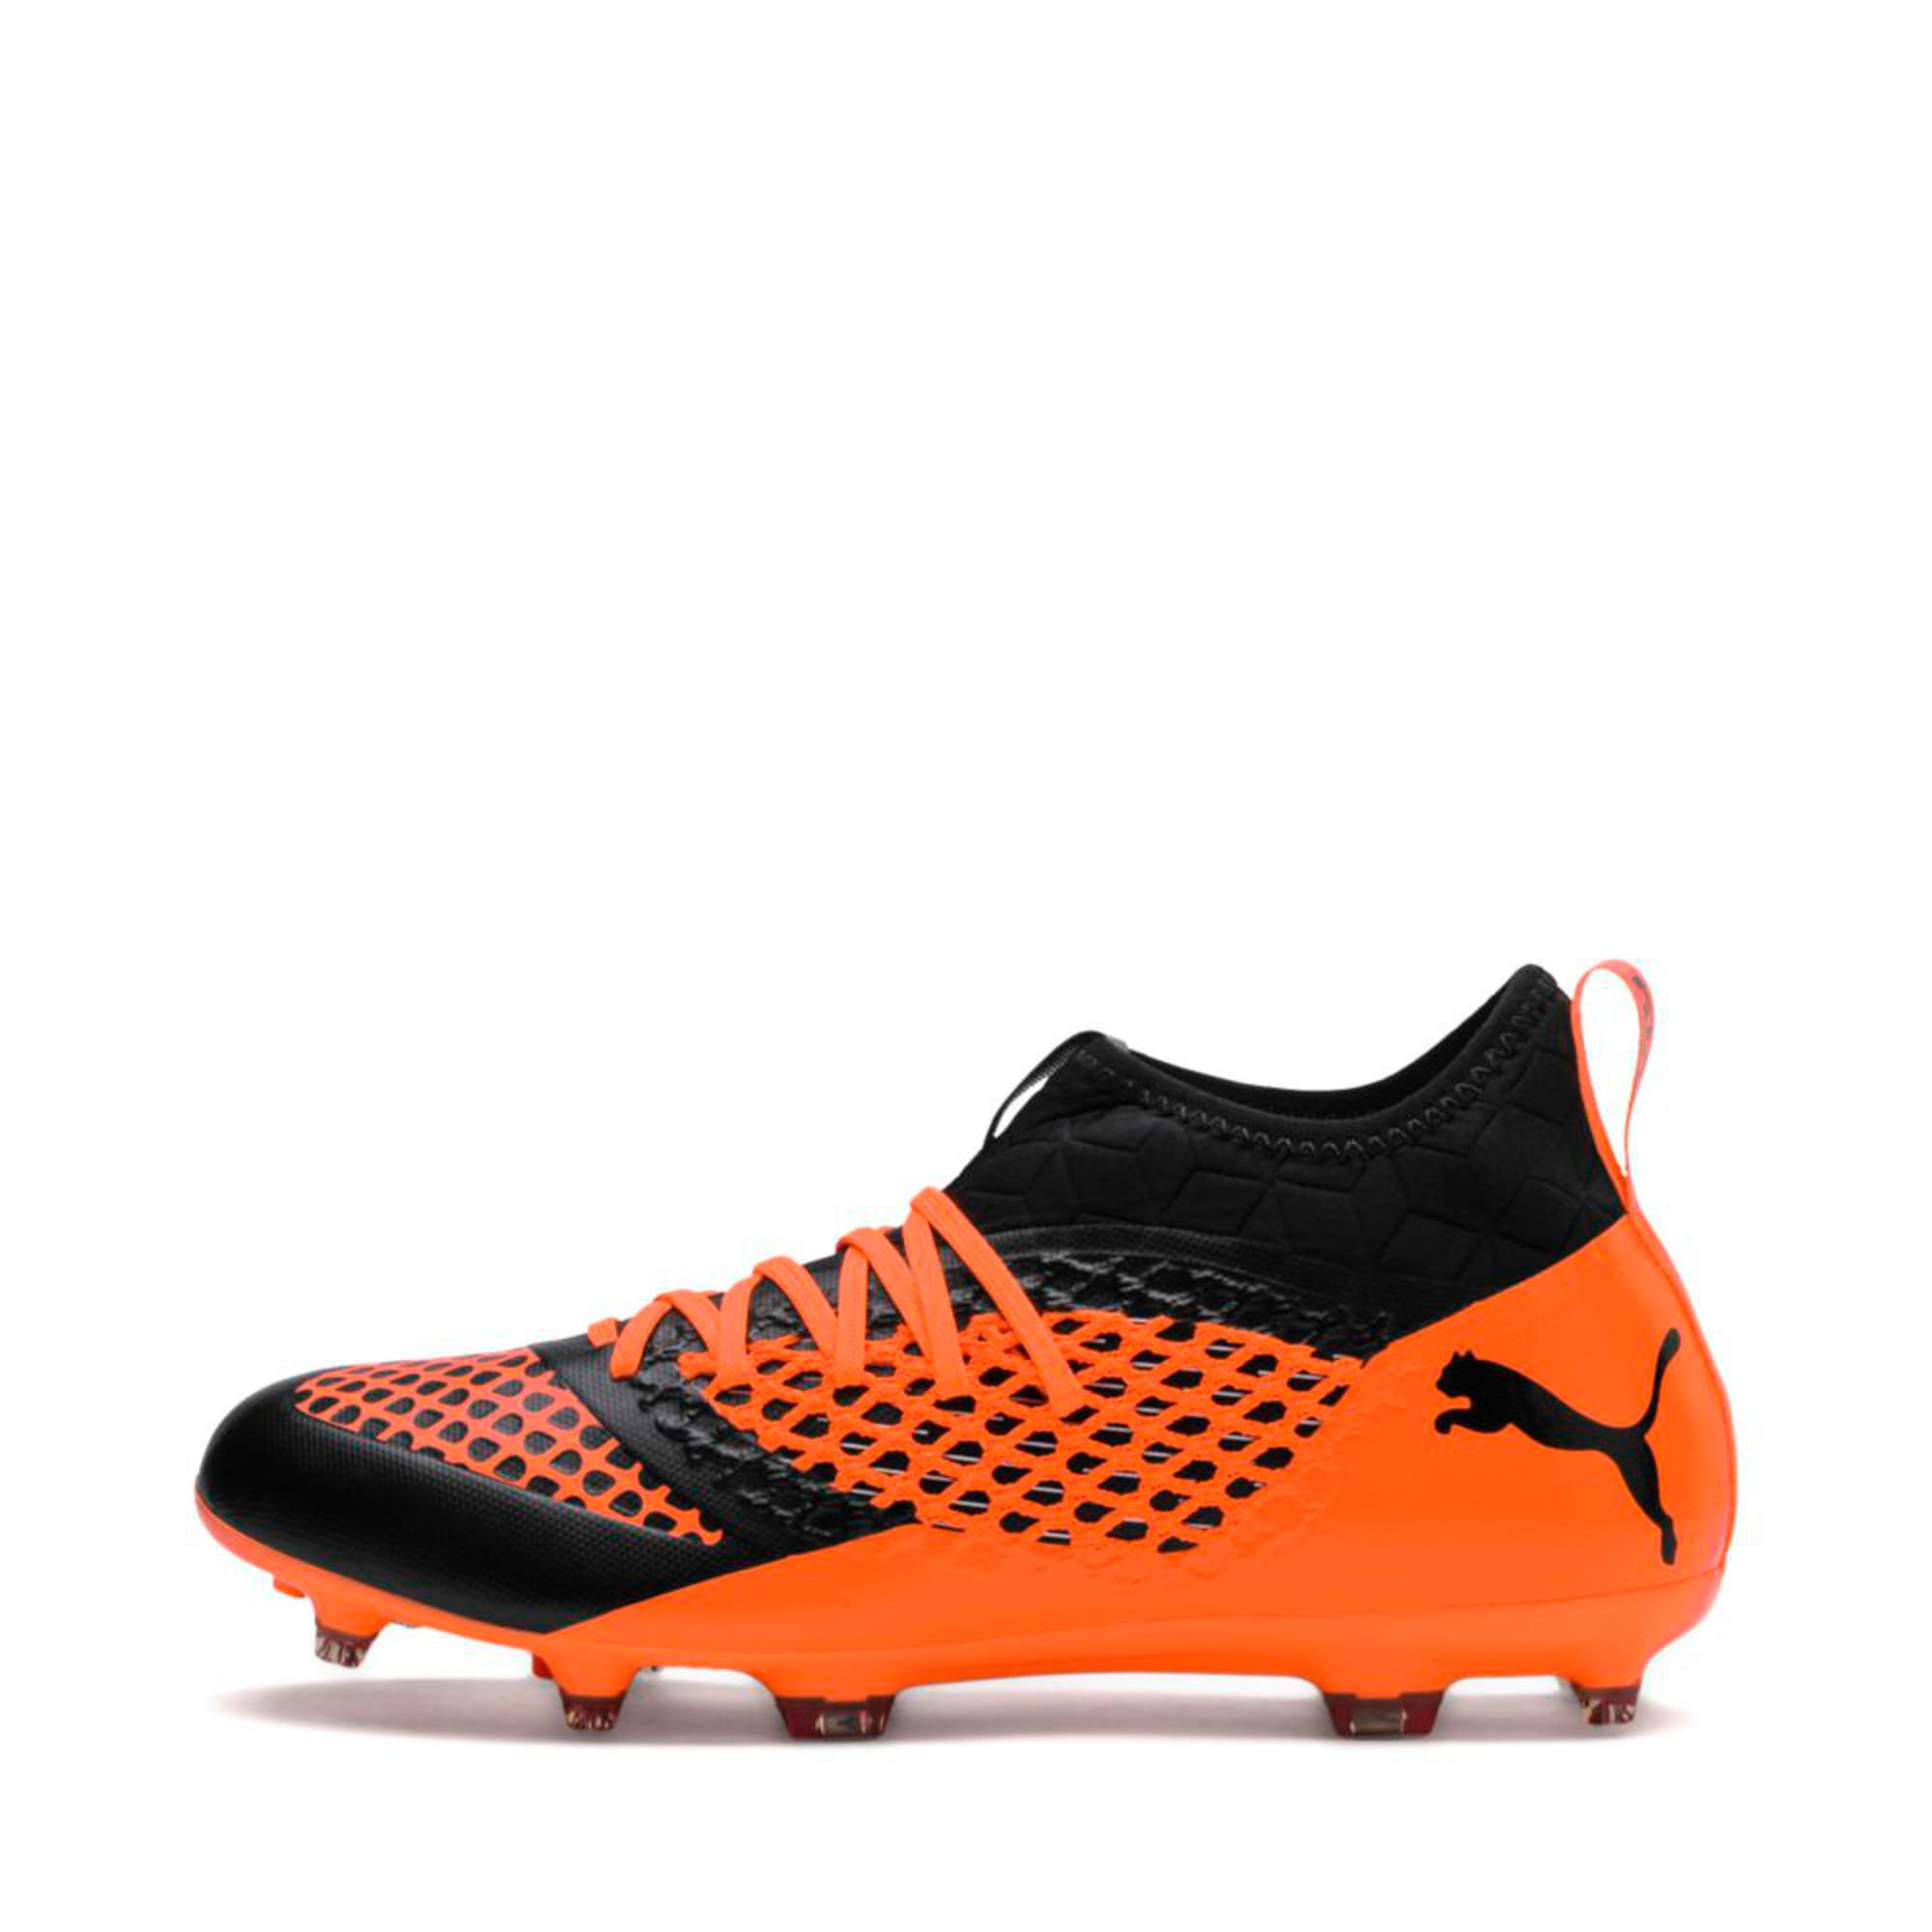 Thumbnail 1 of FUTURE 2.3 NETFIT FG/AG  Football Boots, Puma Black-Shocking Orange, medium-IND